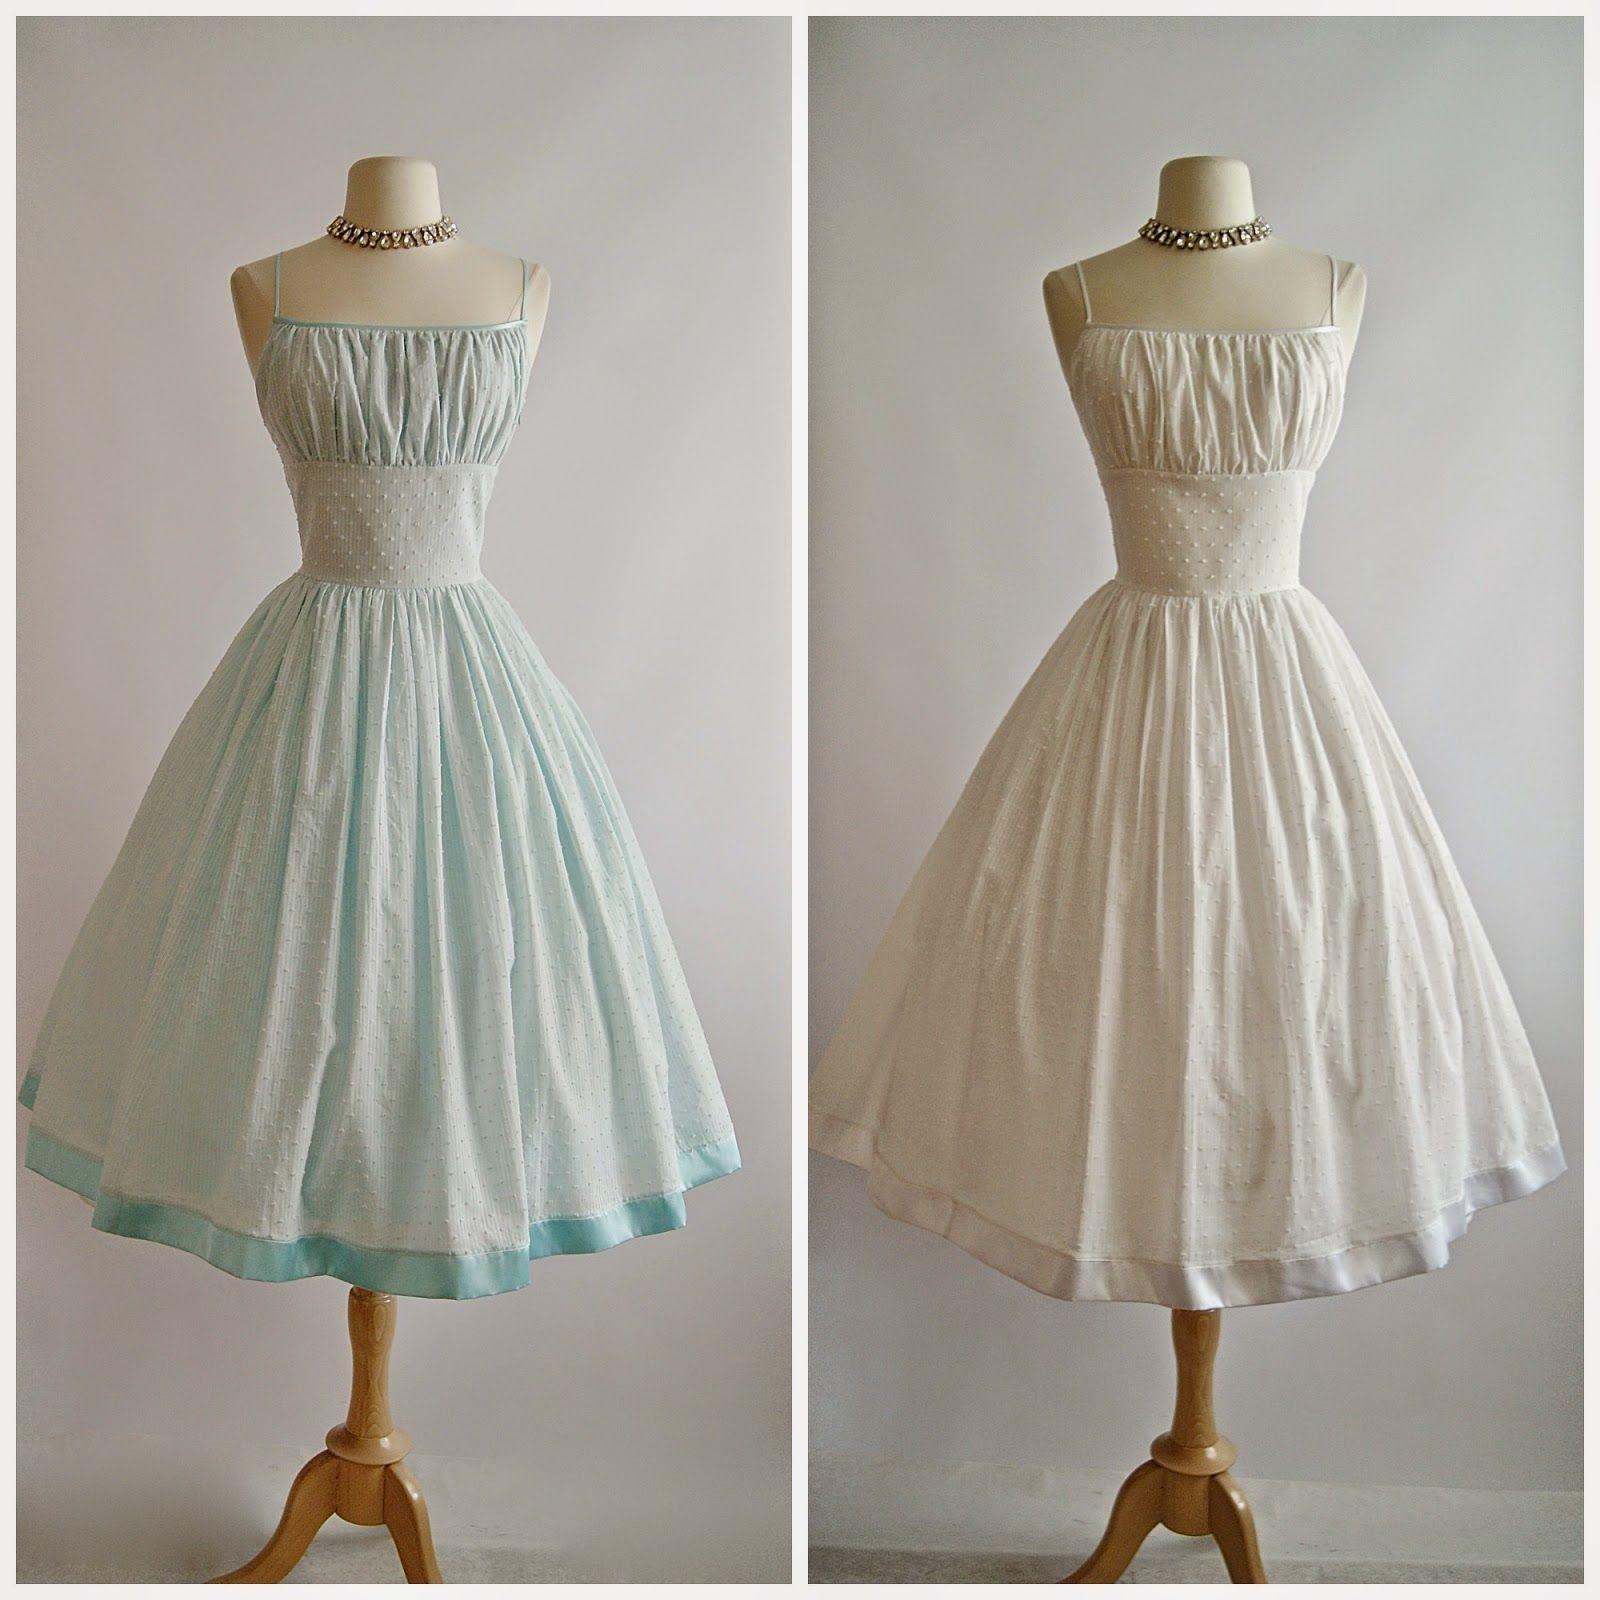 Xtabay Vintage Clothing Boutique - Portland, Oregon | Clothes ...